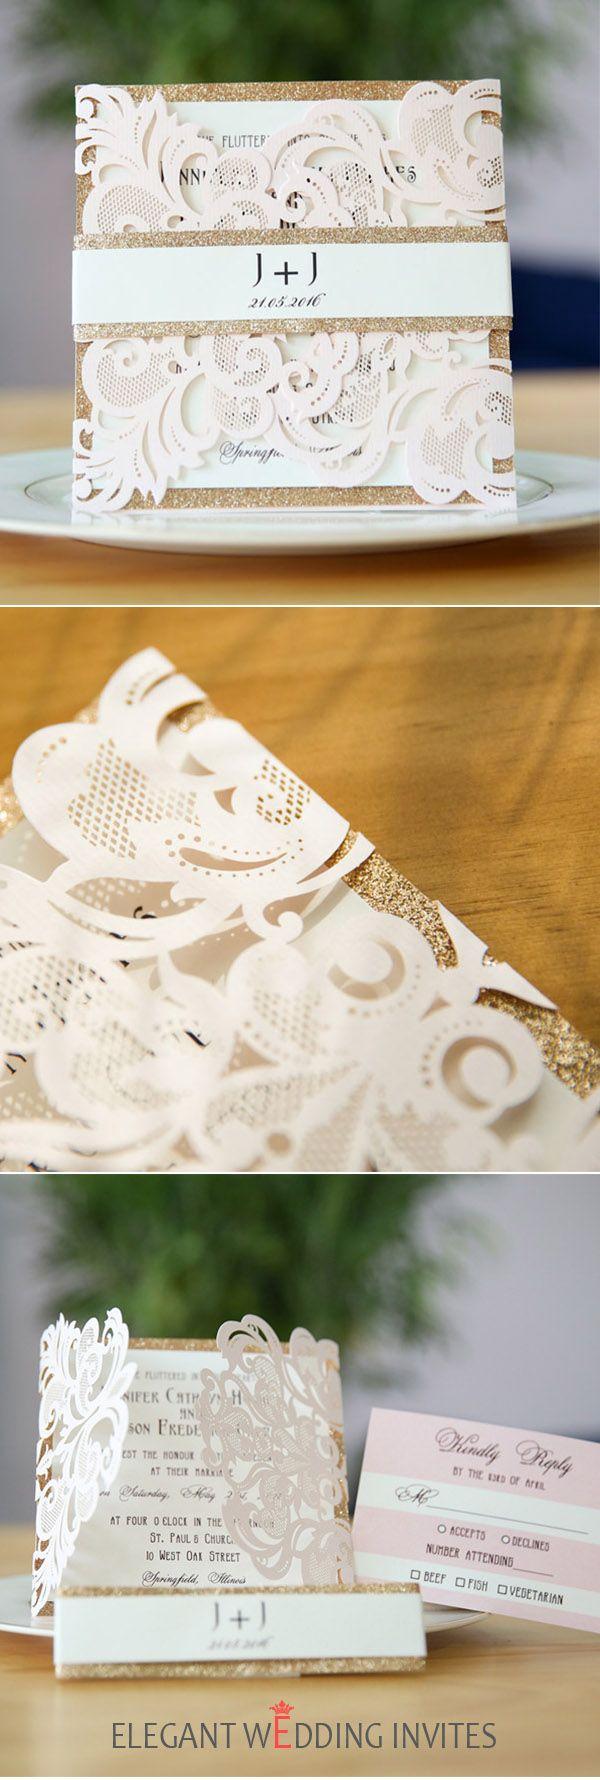 diy wedding invitations elegant%0A elegant blush pink laser cut wedding invitation with rose gold glitter  belly band